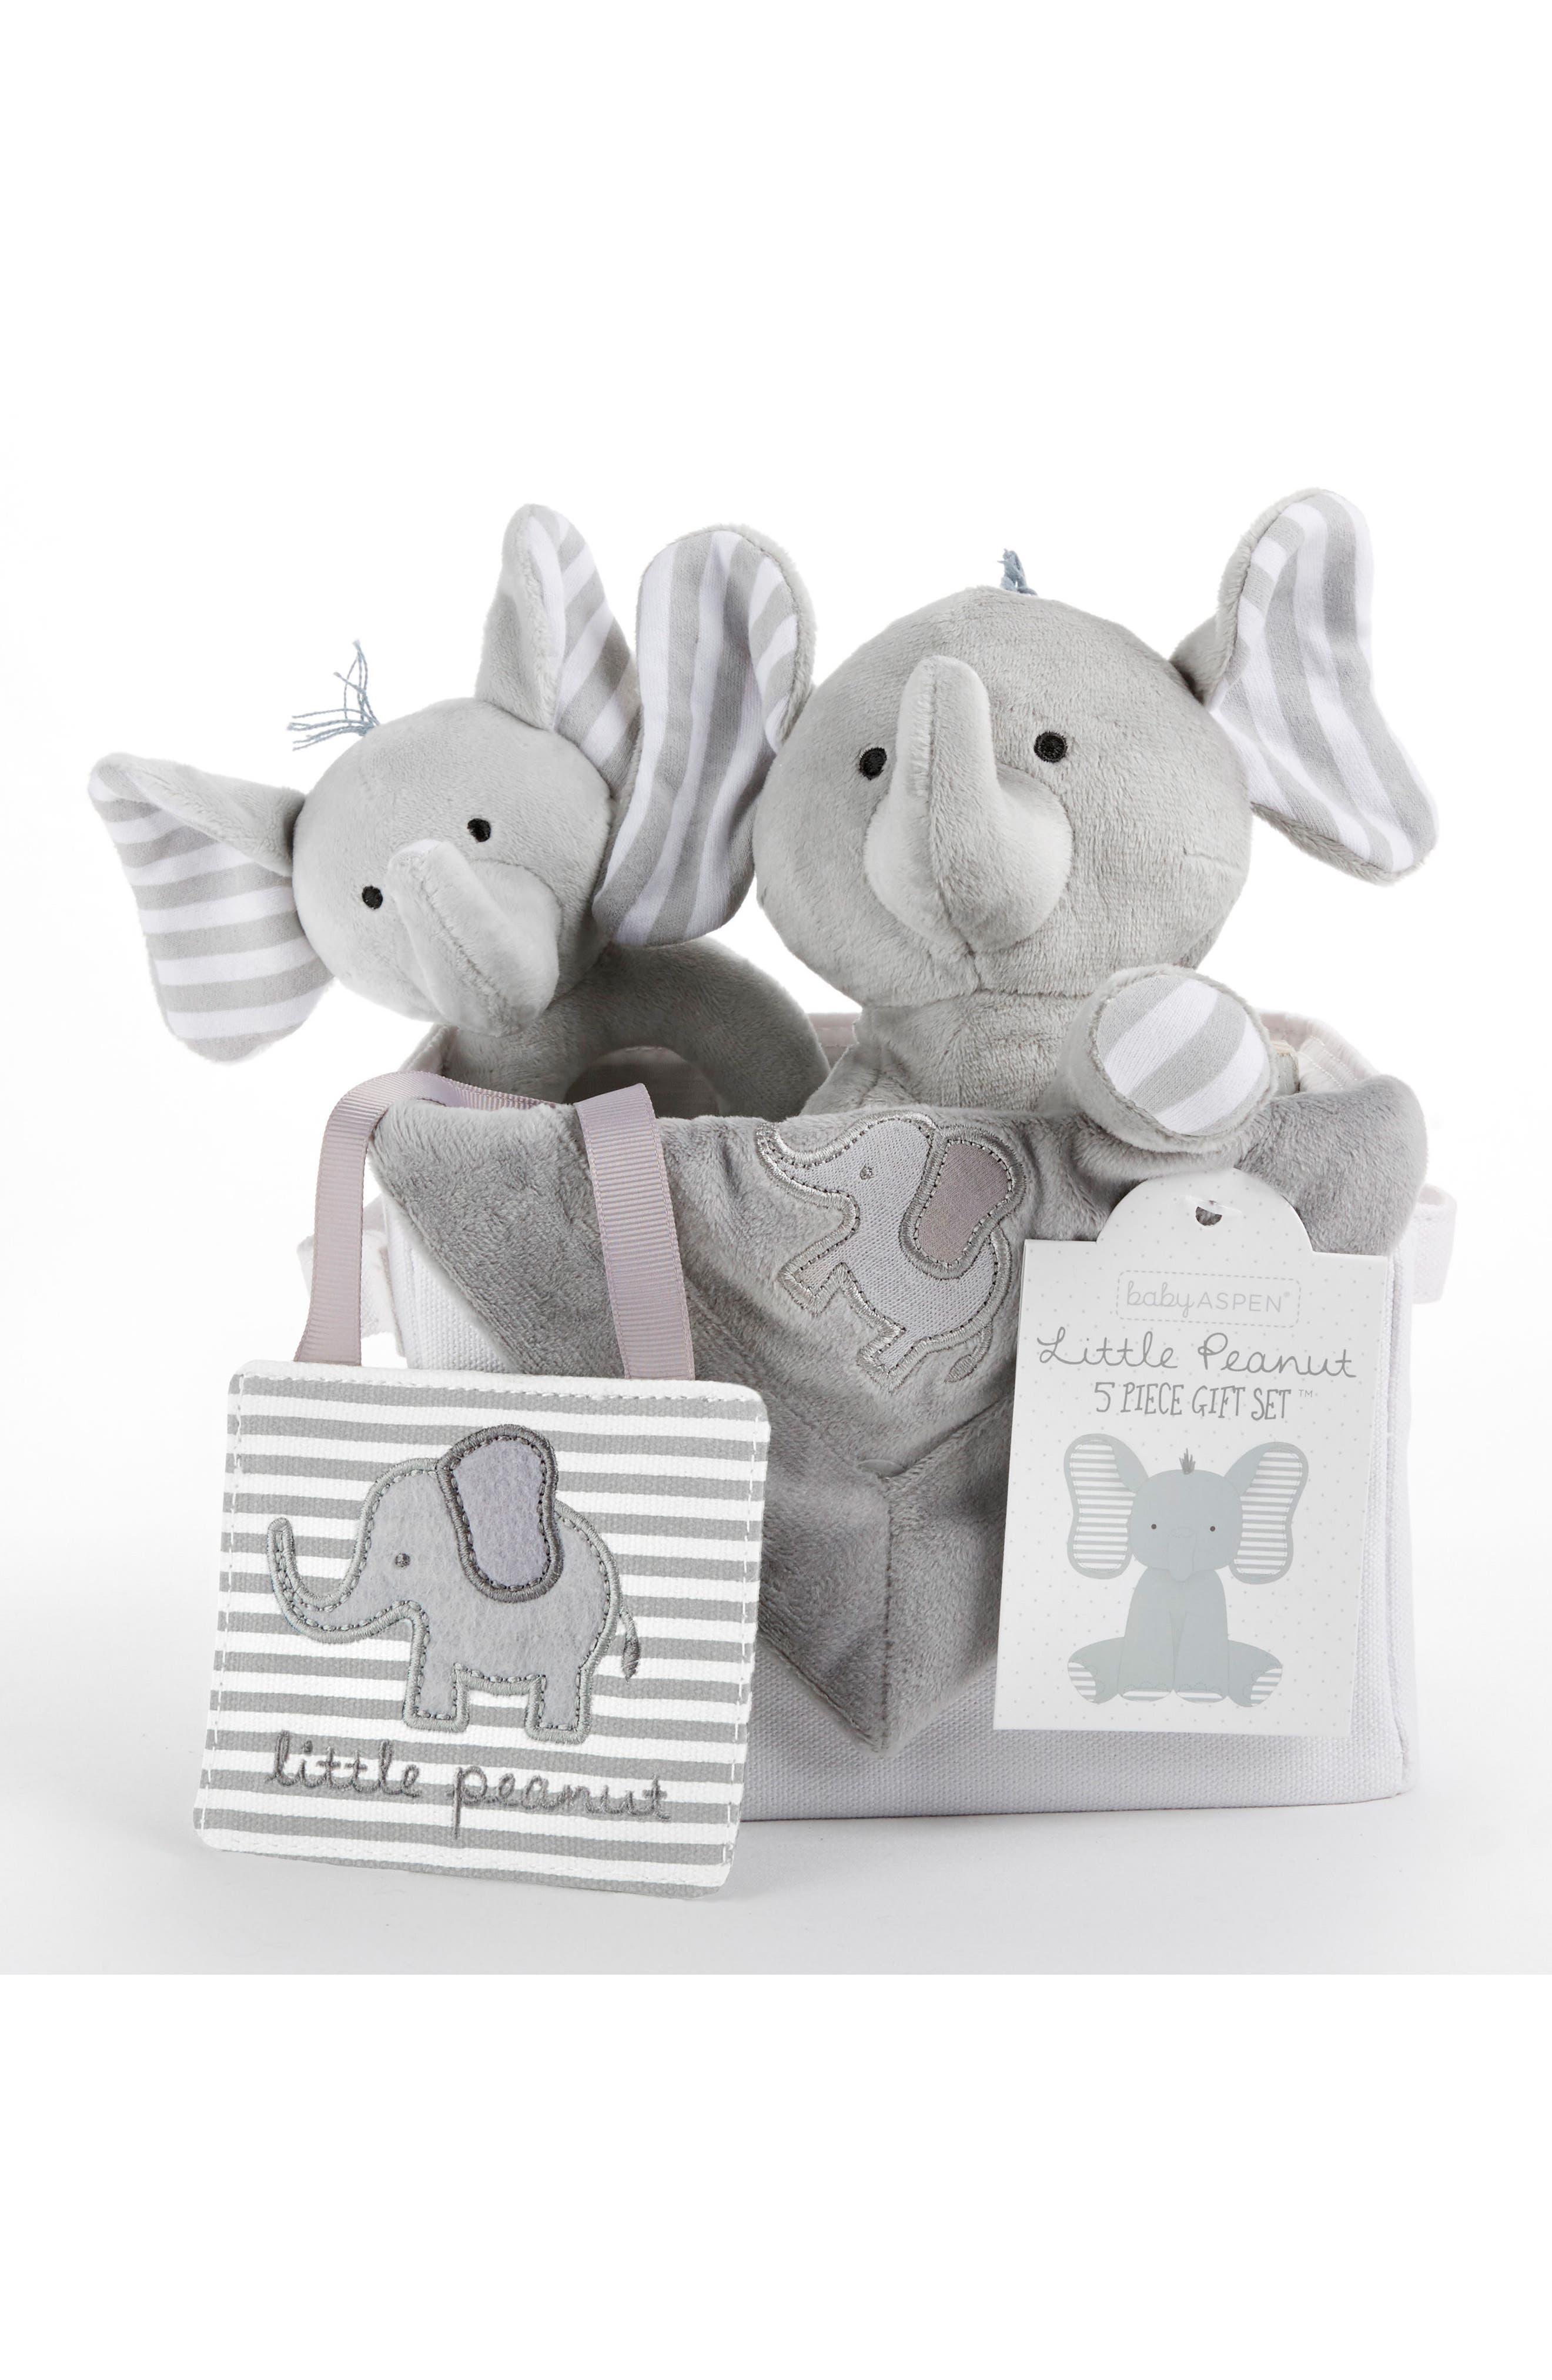 Baby Aspen Little Peanut Elephant 5-Piece Gift Set